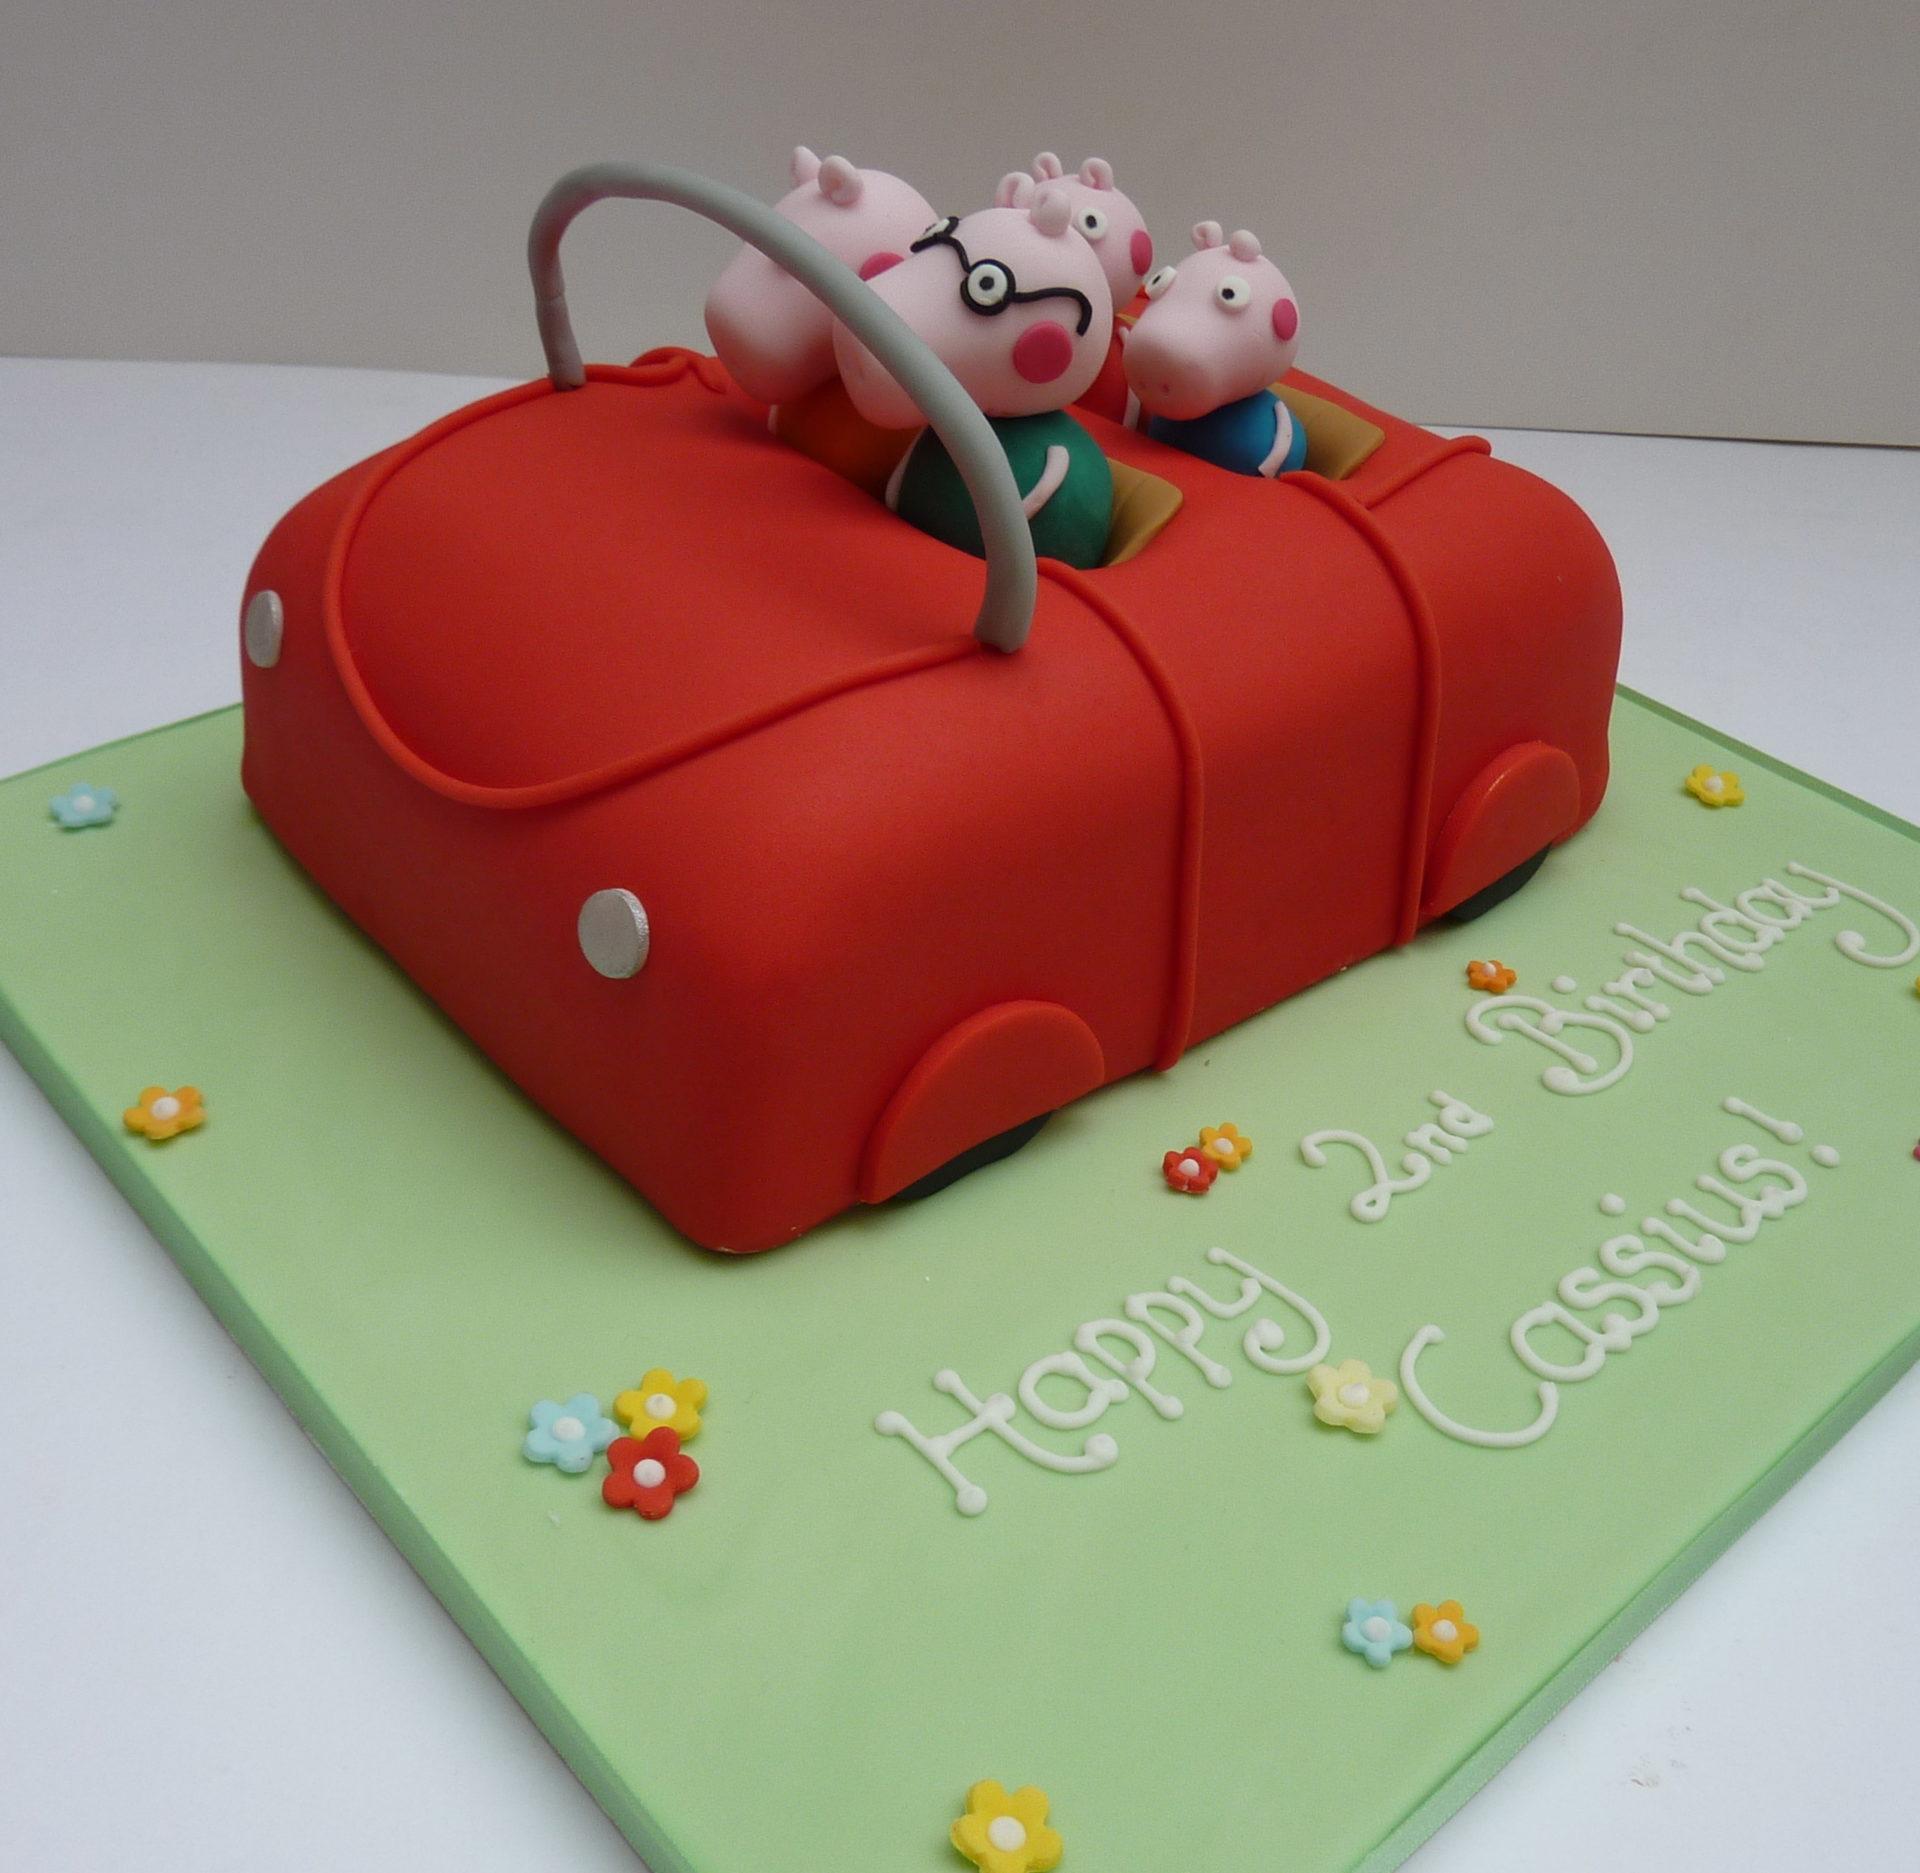 Peppa Pig's Car Cake